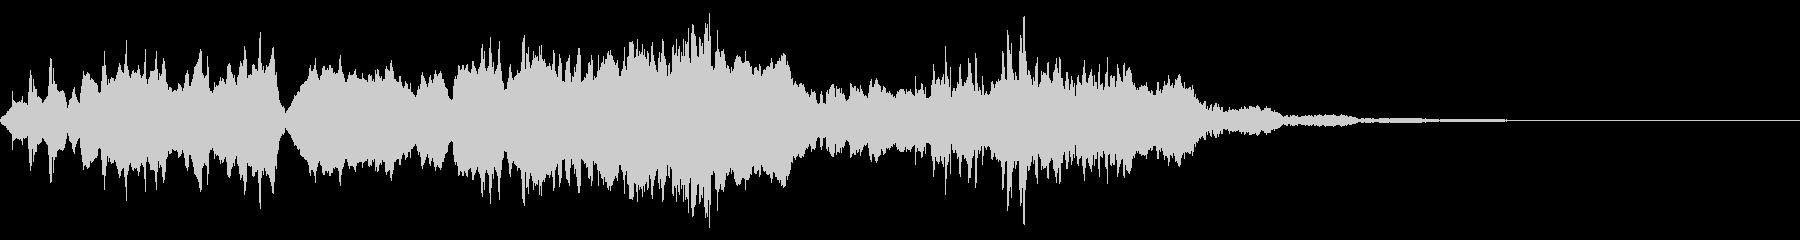 【SE 効果音】奇妙な音8の未再生の波形